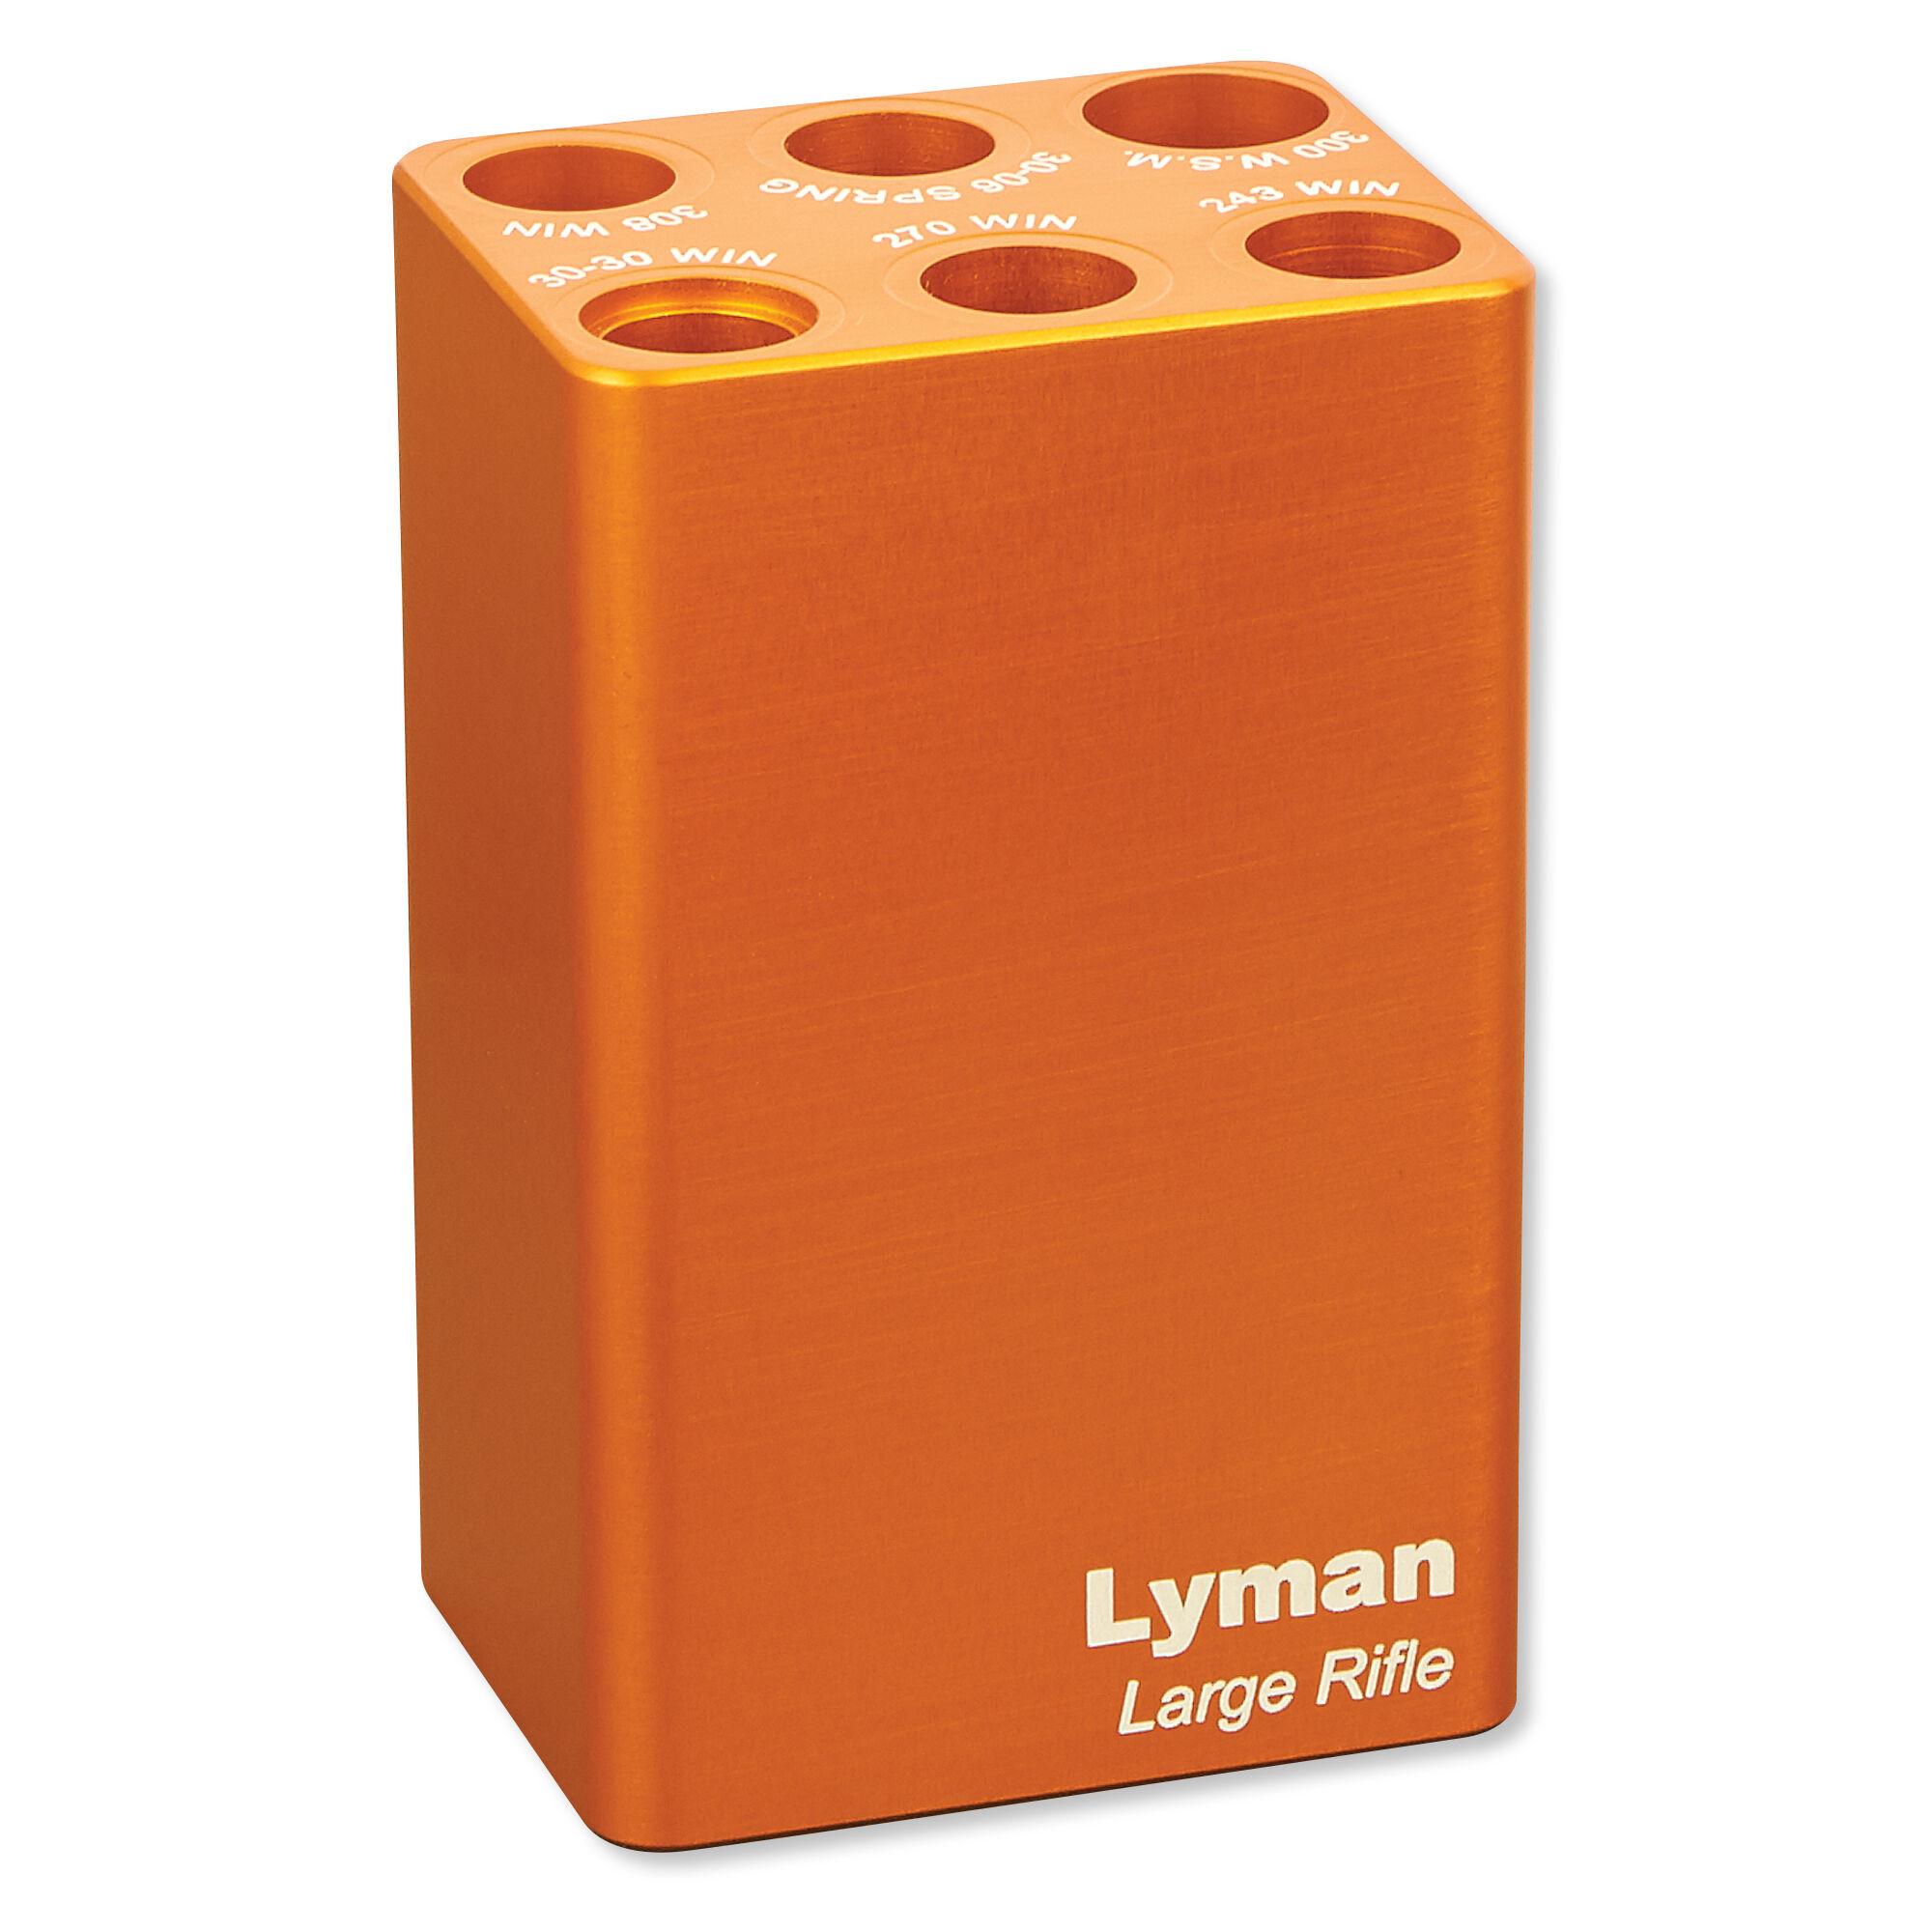 Lyman Ammo Checker Large Rifle 7833002